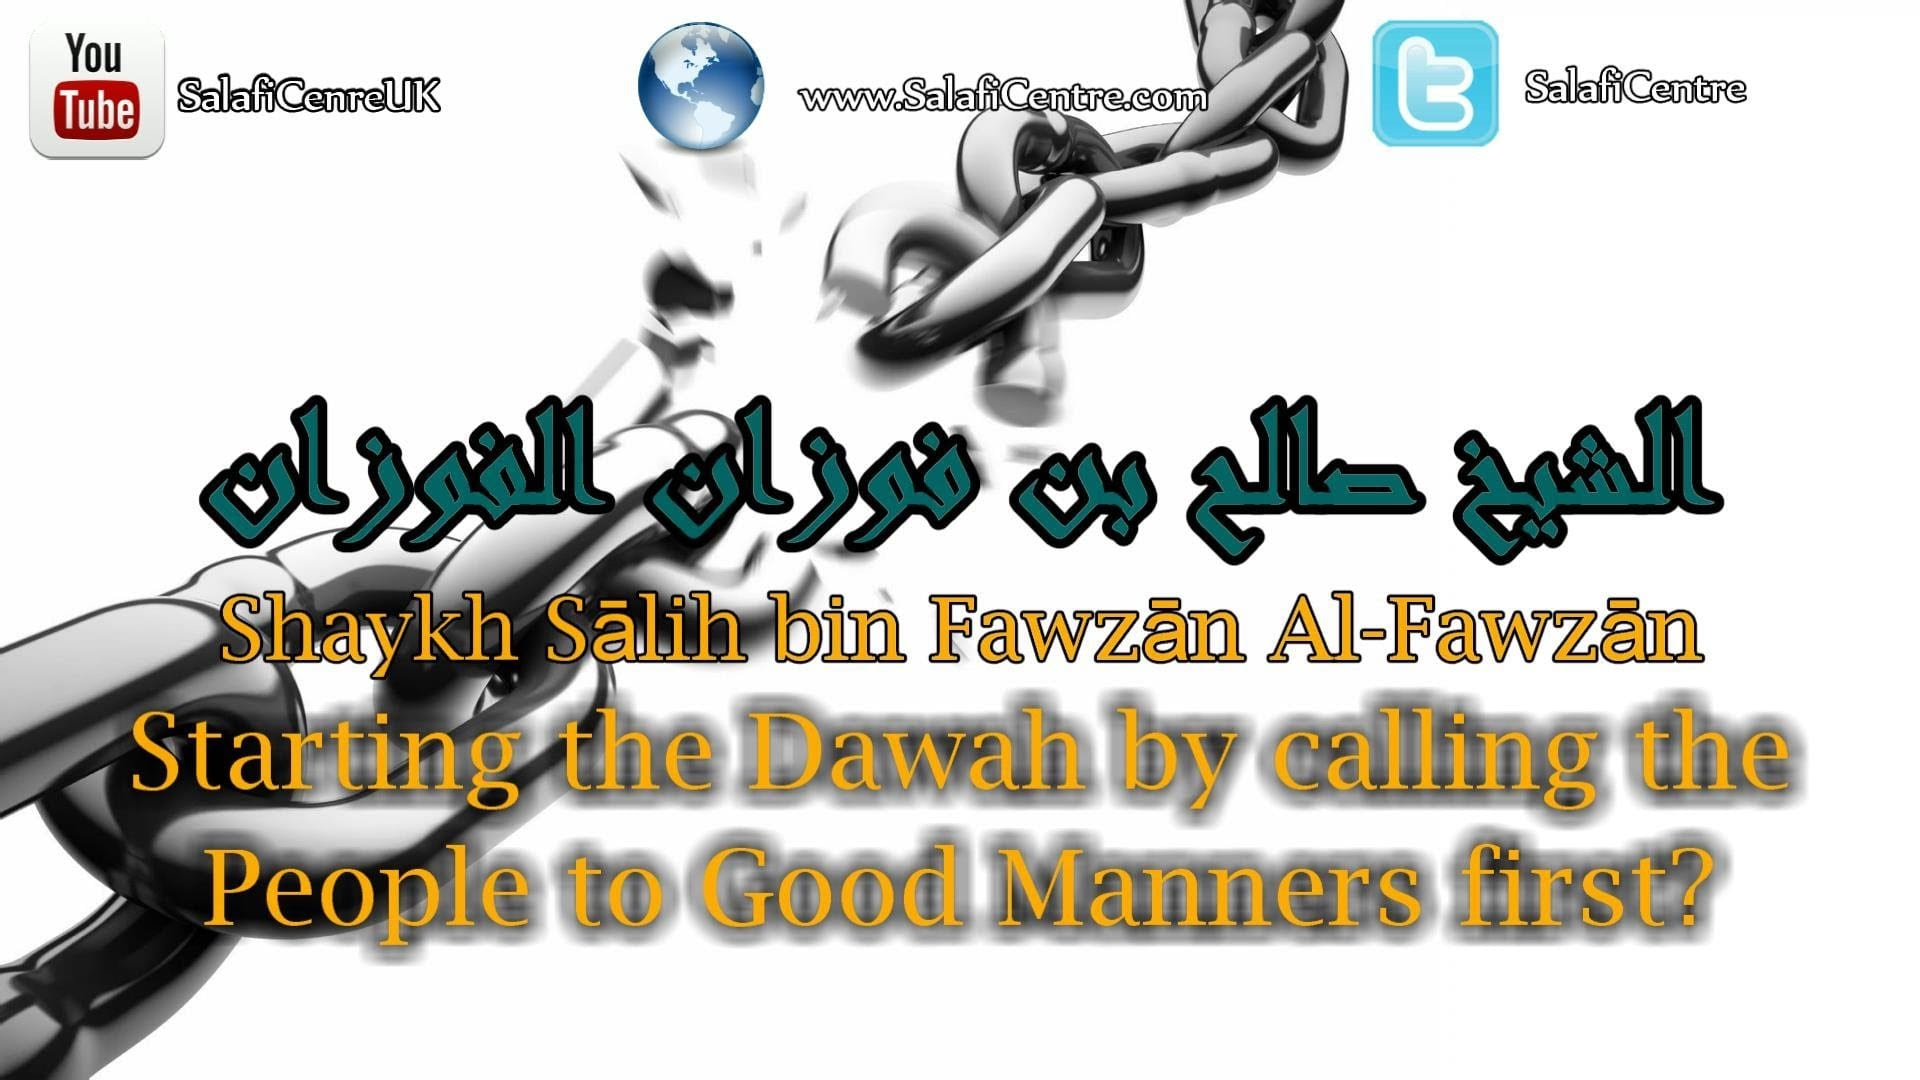 Beginning the Dawah by Calling to Good Manners First? | Shaykh Sālih bin Fawzān Al-Fawzān